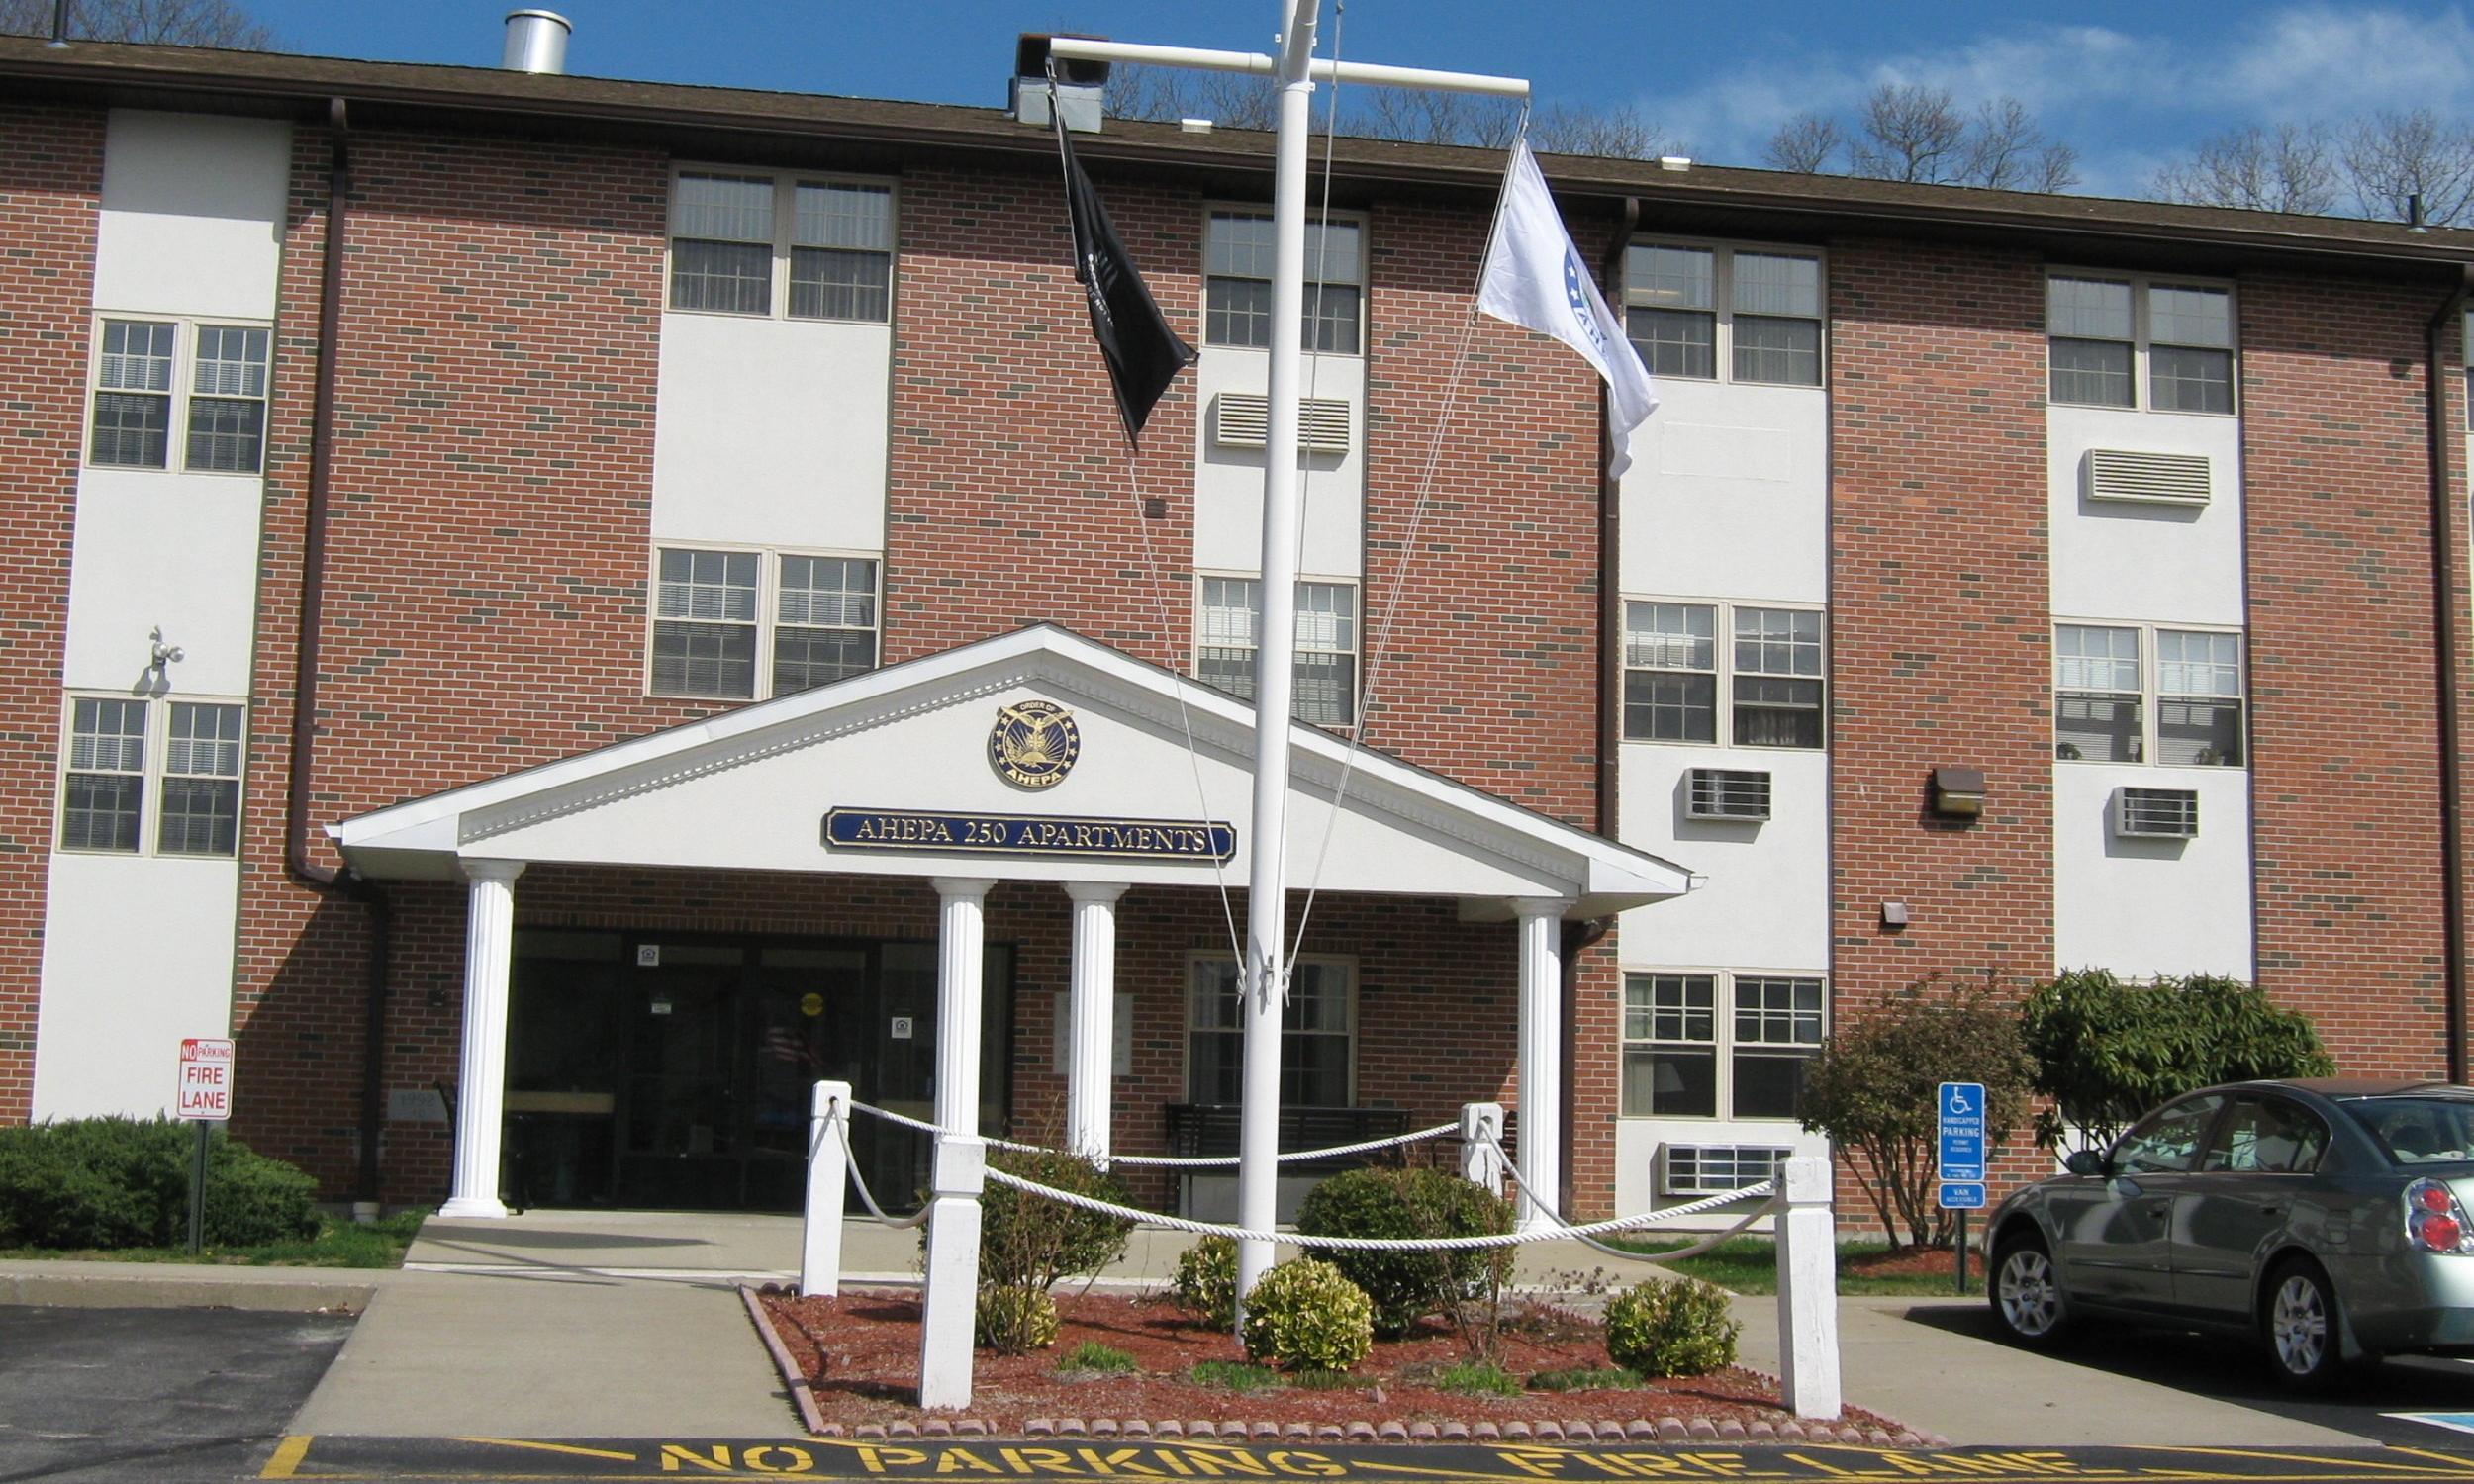 AHEPA 250 Senior Apartments - 267 Roxbury RoadNiantic, CT 06357(860) 691-1129TTY: (800) 676-3777 or 711 (English)TTY: (800) 676-4290 or 711 (Español)info@ahepahousing.org